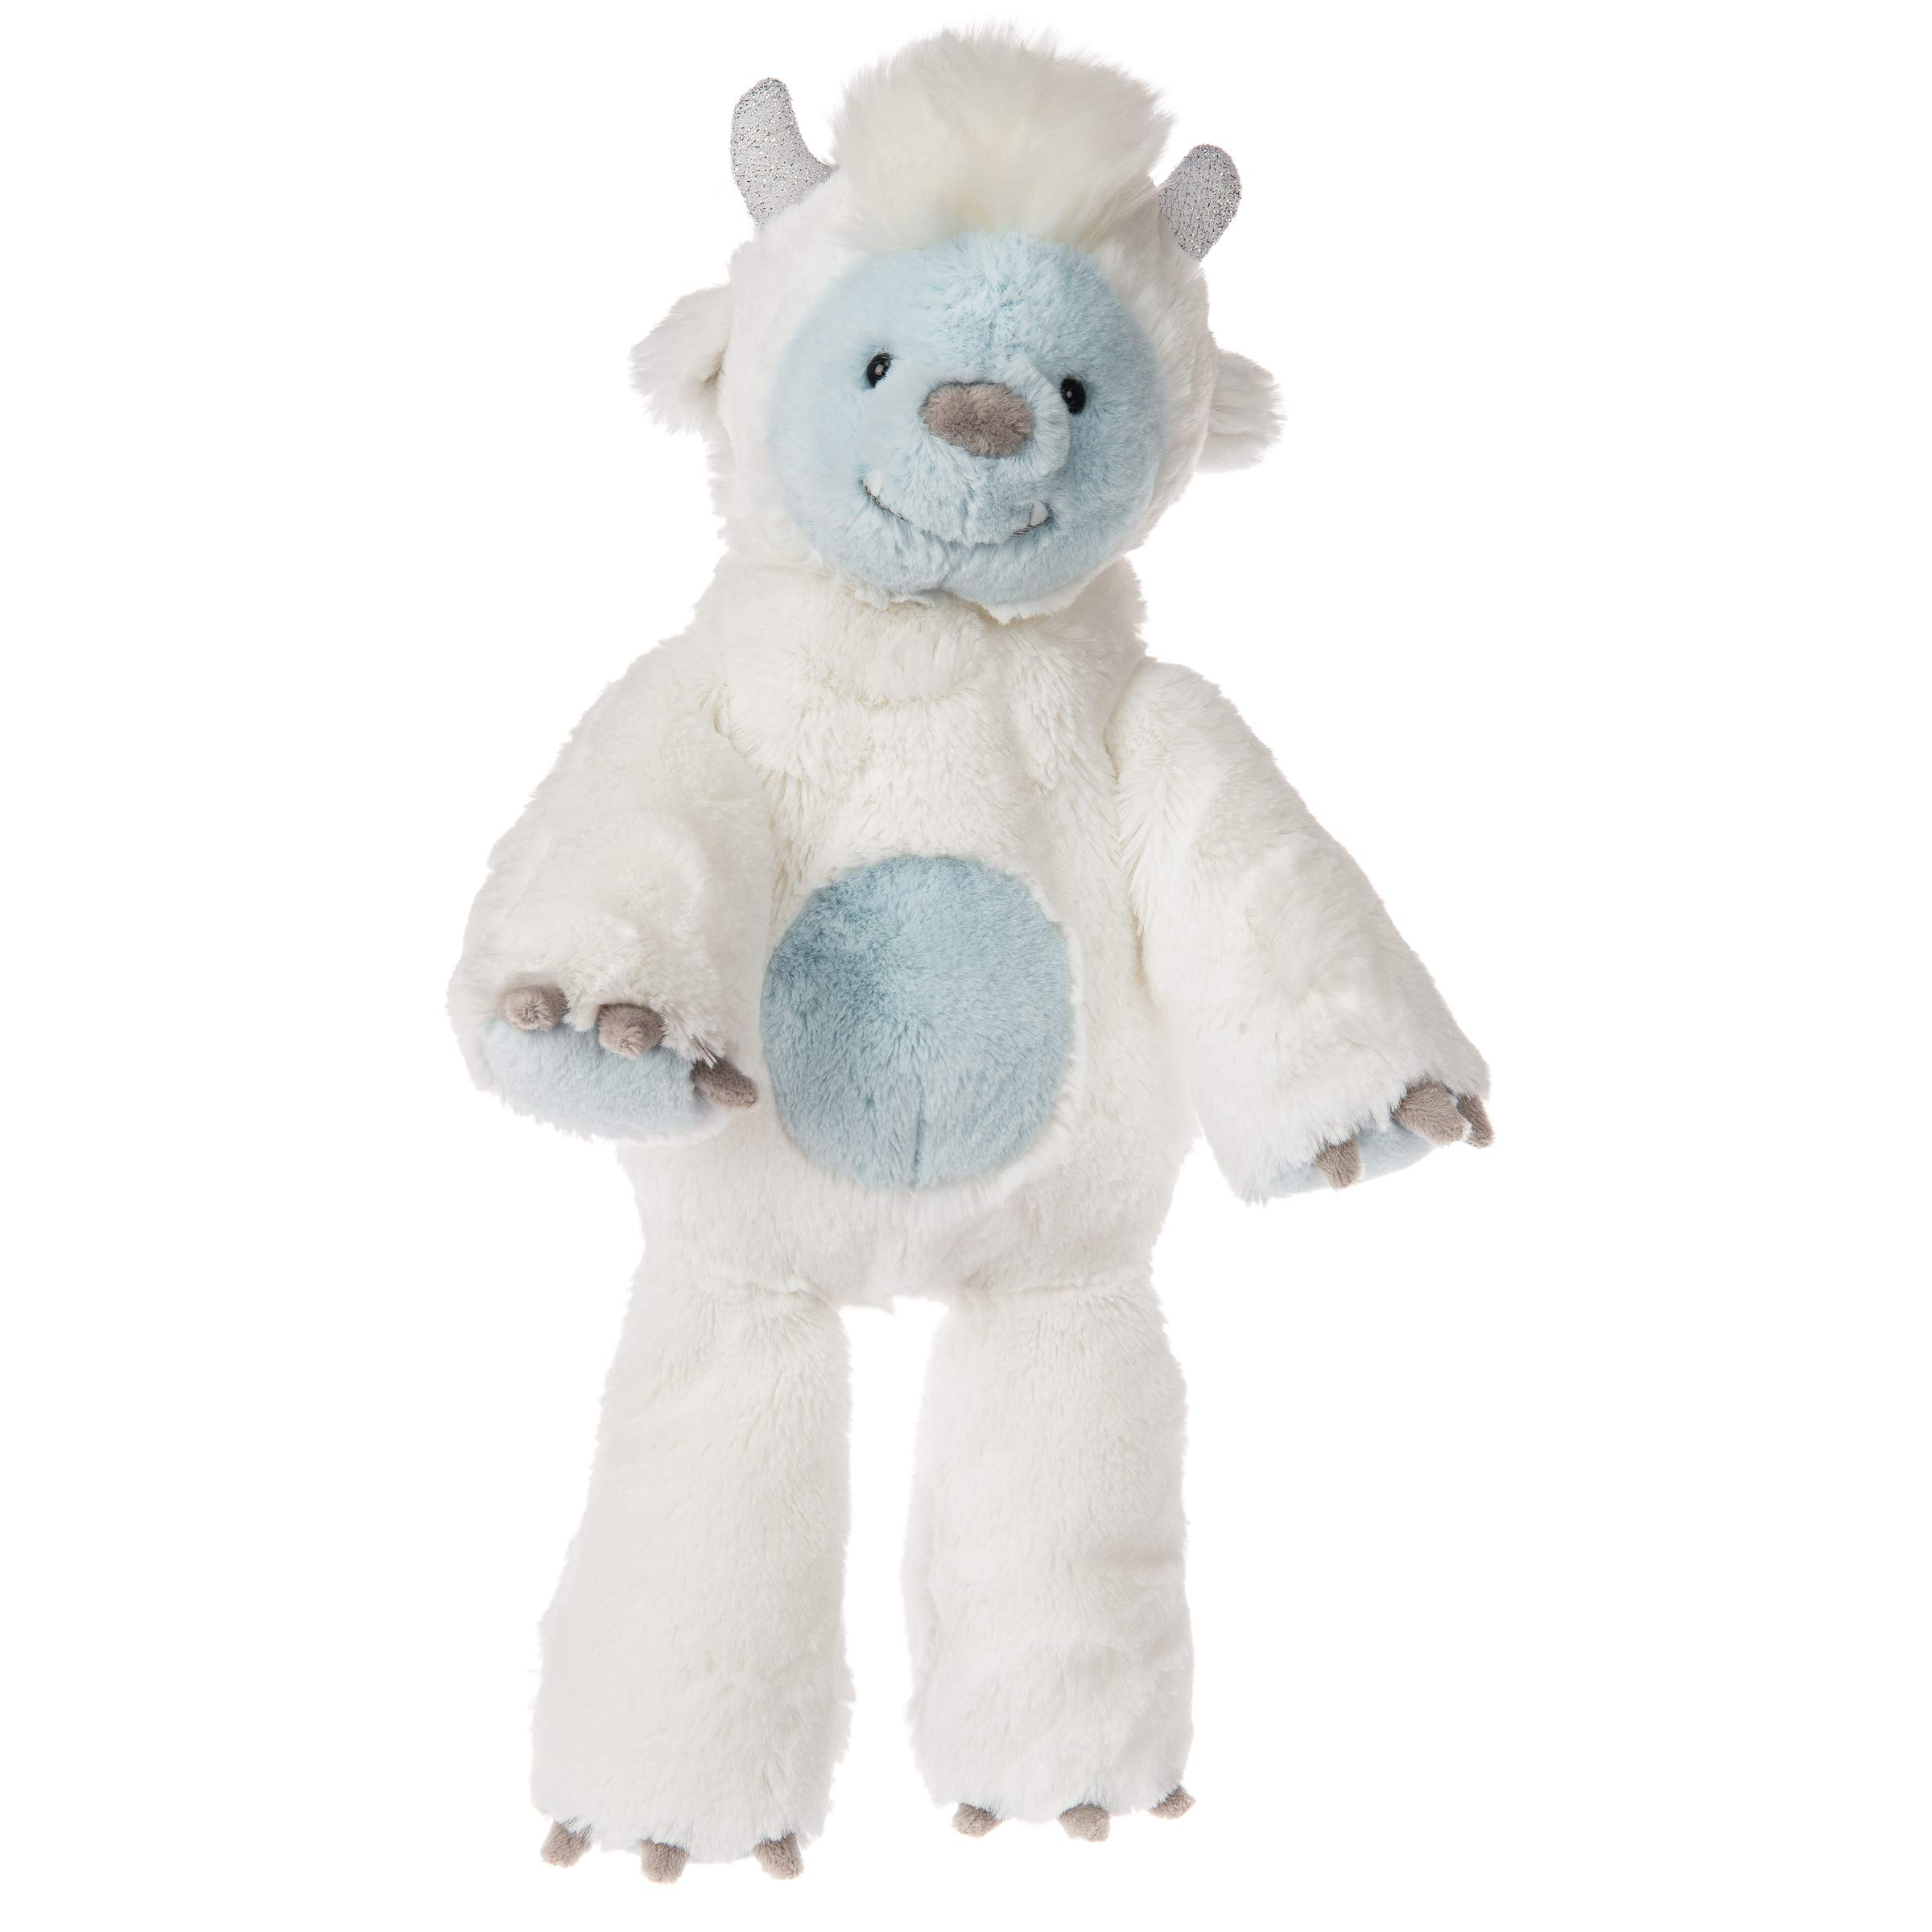 Mary Meyer FabFuzz Stuffed Animal Soft Toy, Yeti, 14-Inches by Mary Meyer